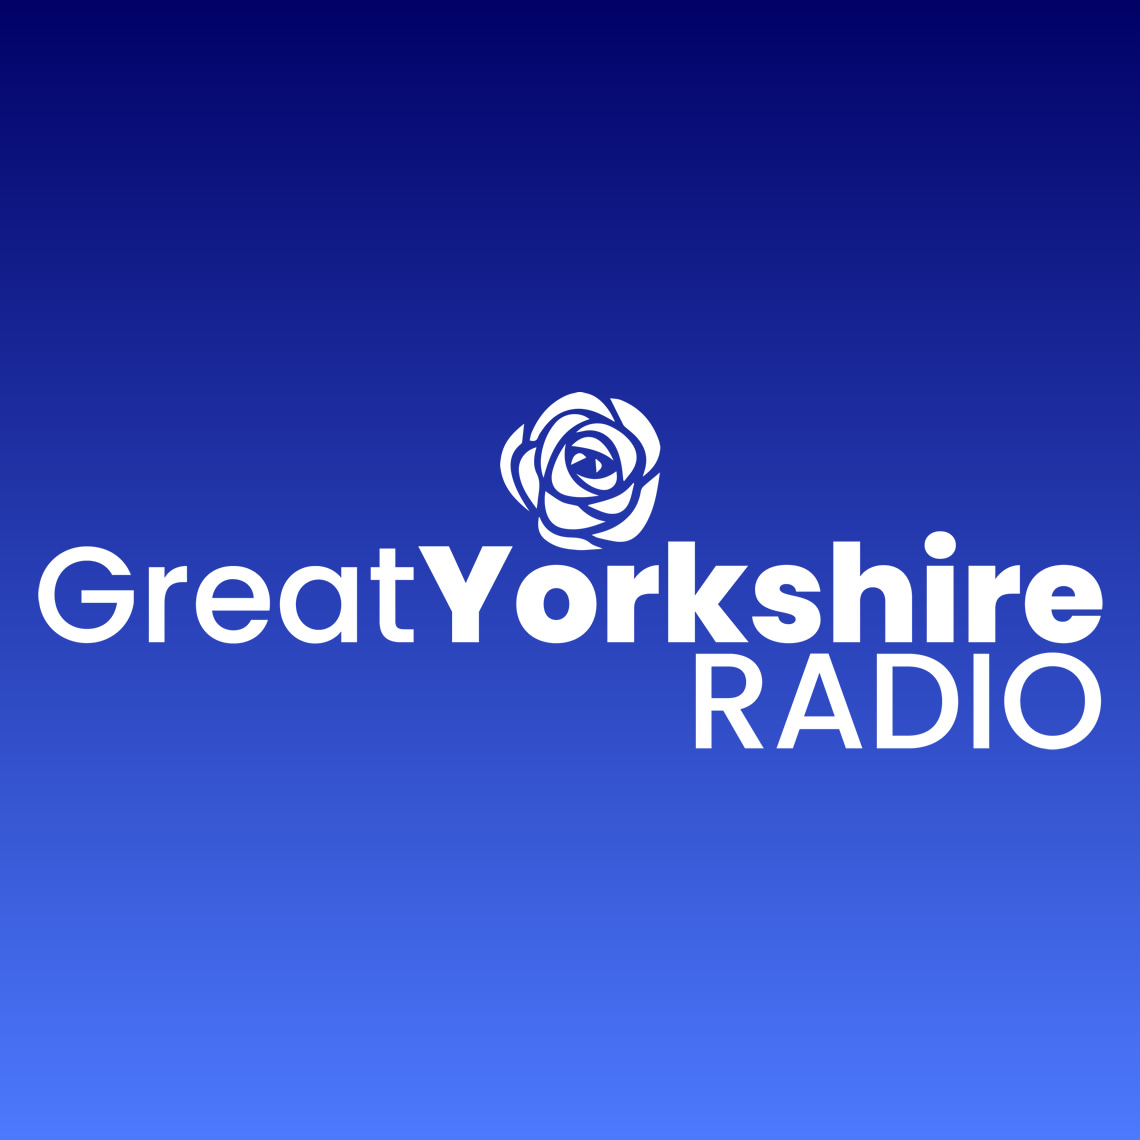 Great Yorkshire Radio